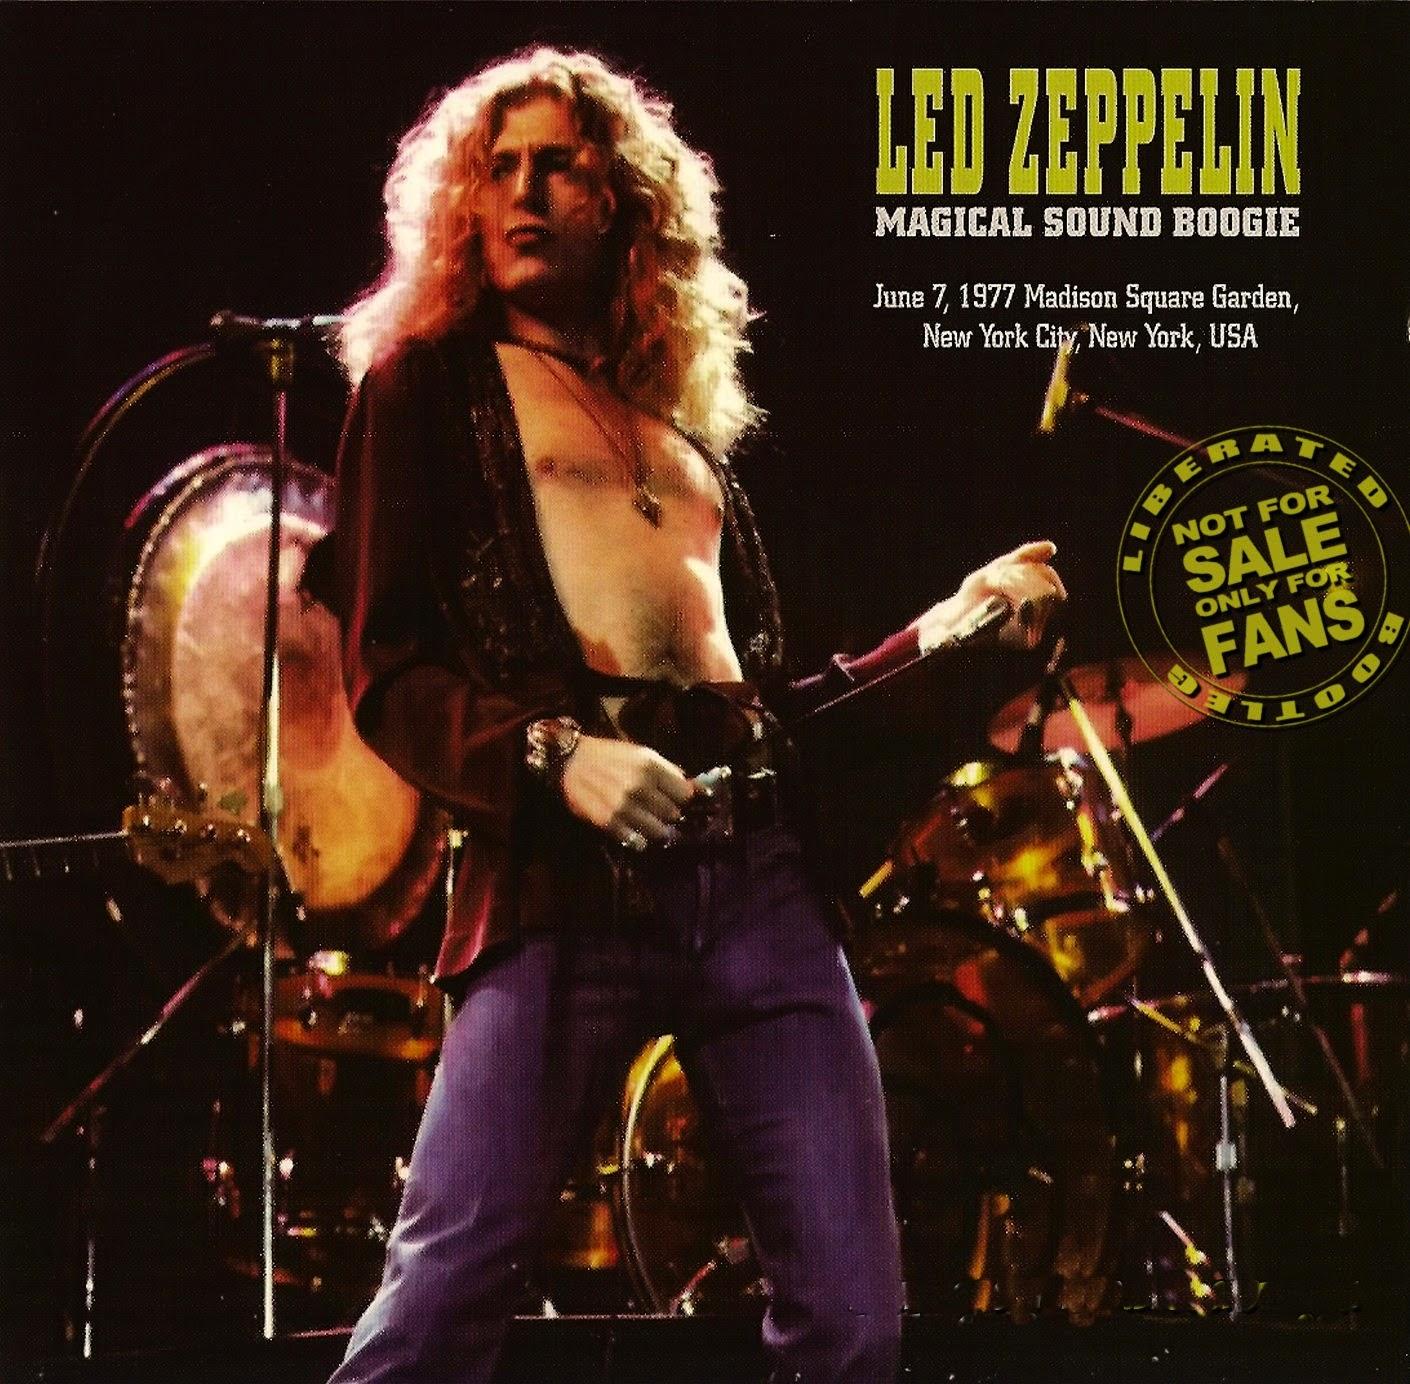 1969 - Led Zeppelin - Magical Sound Boogie - Bootleg